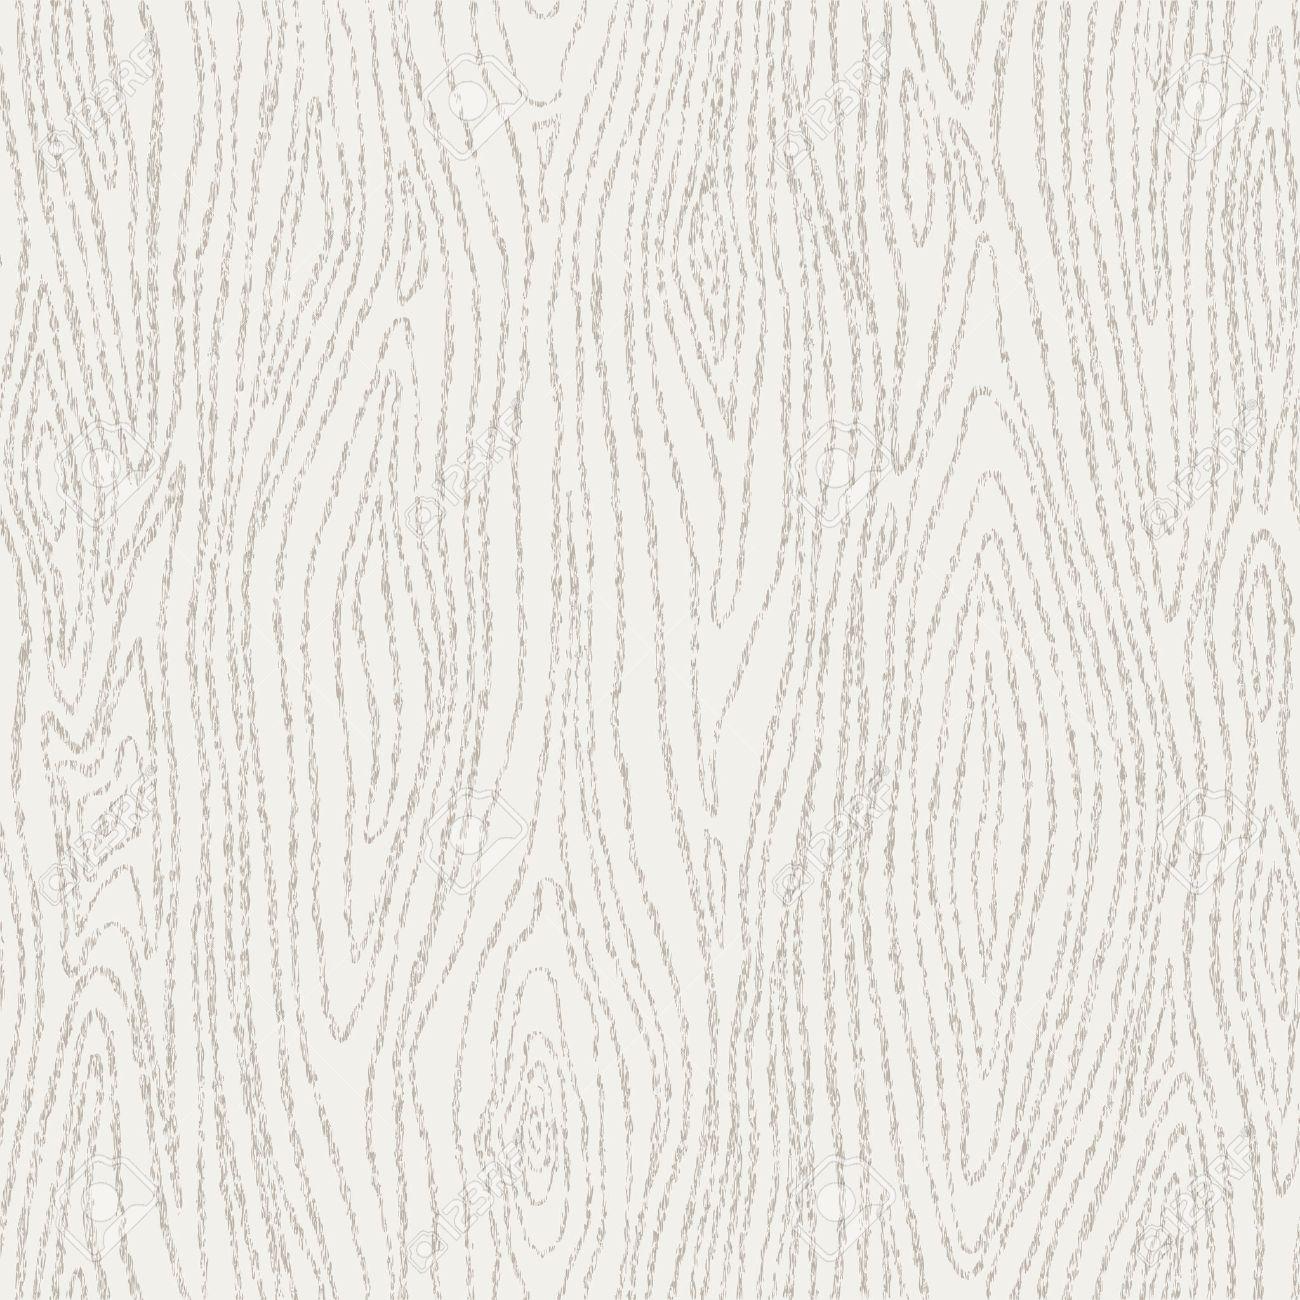 Wood texture template  Seamless pattern  Vector illustration  Stock Vector   36248297. Wood Texture Template  Seamless Pattern  Vector Illustration